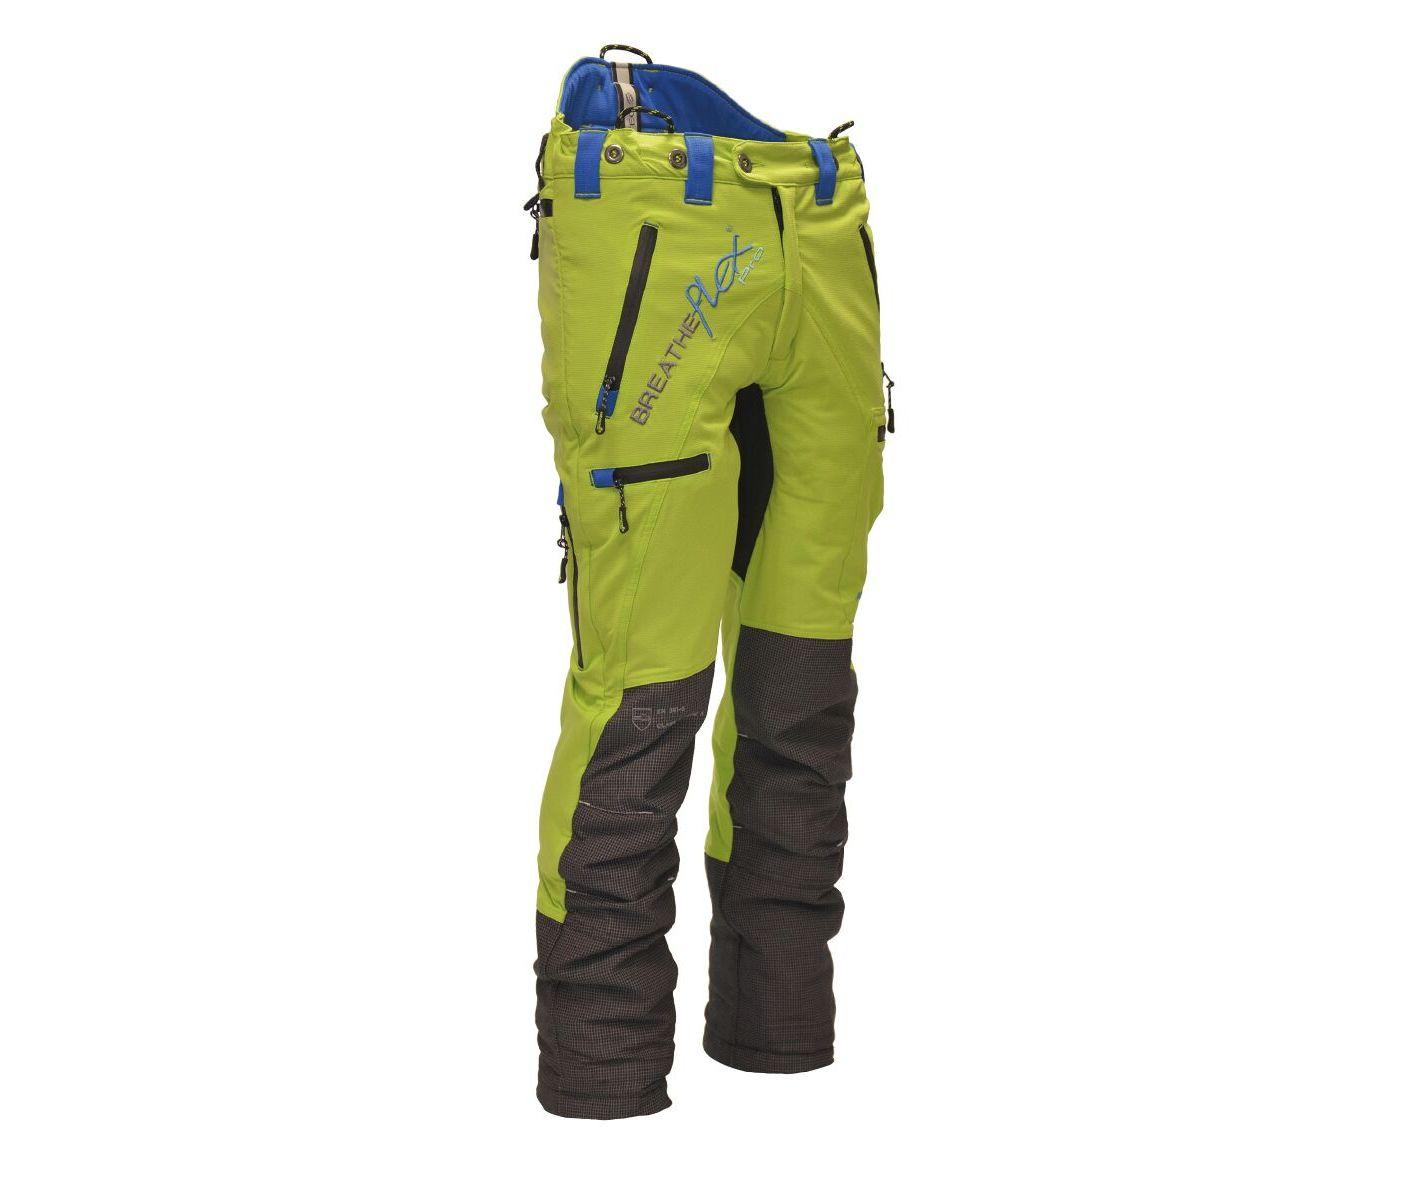 Arbortec Breatheflex Pro chainsaw trousers Type C, class 1 (Lime) (Large, Long leg)